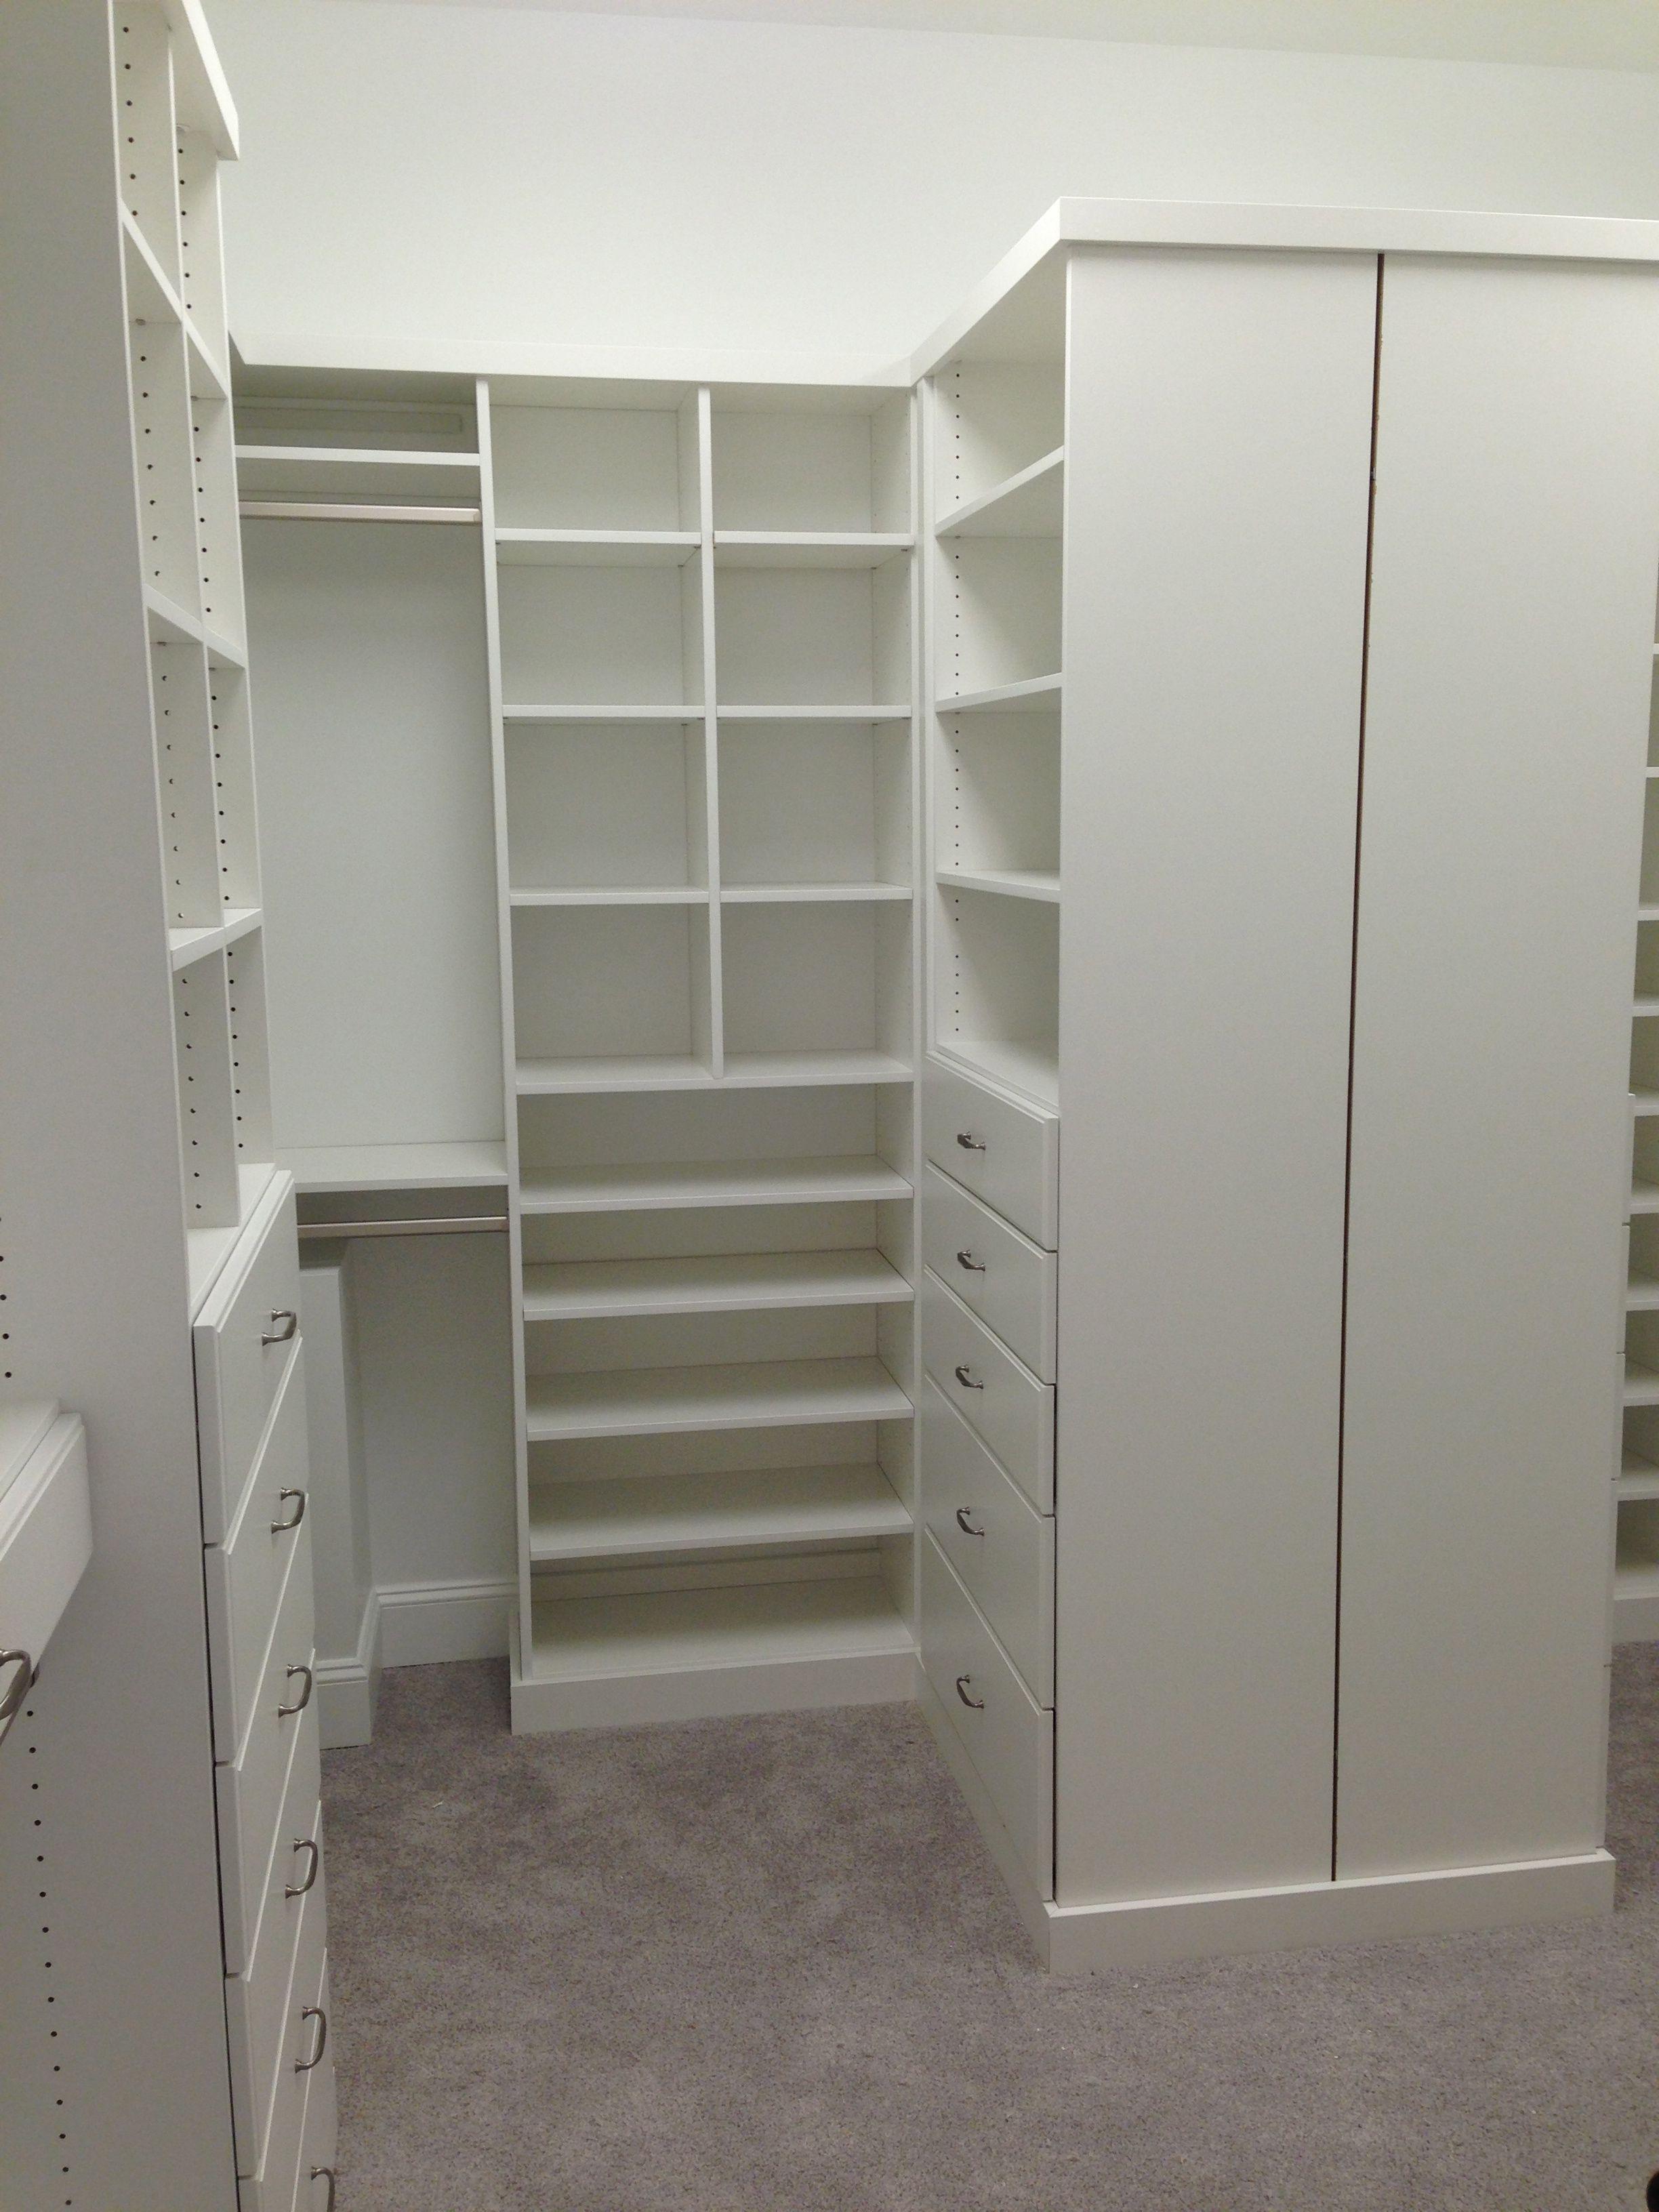 Closet Creations Built This White Closet